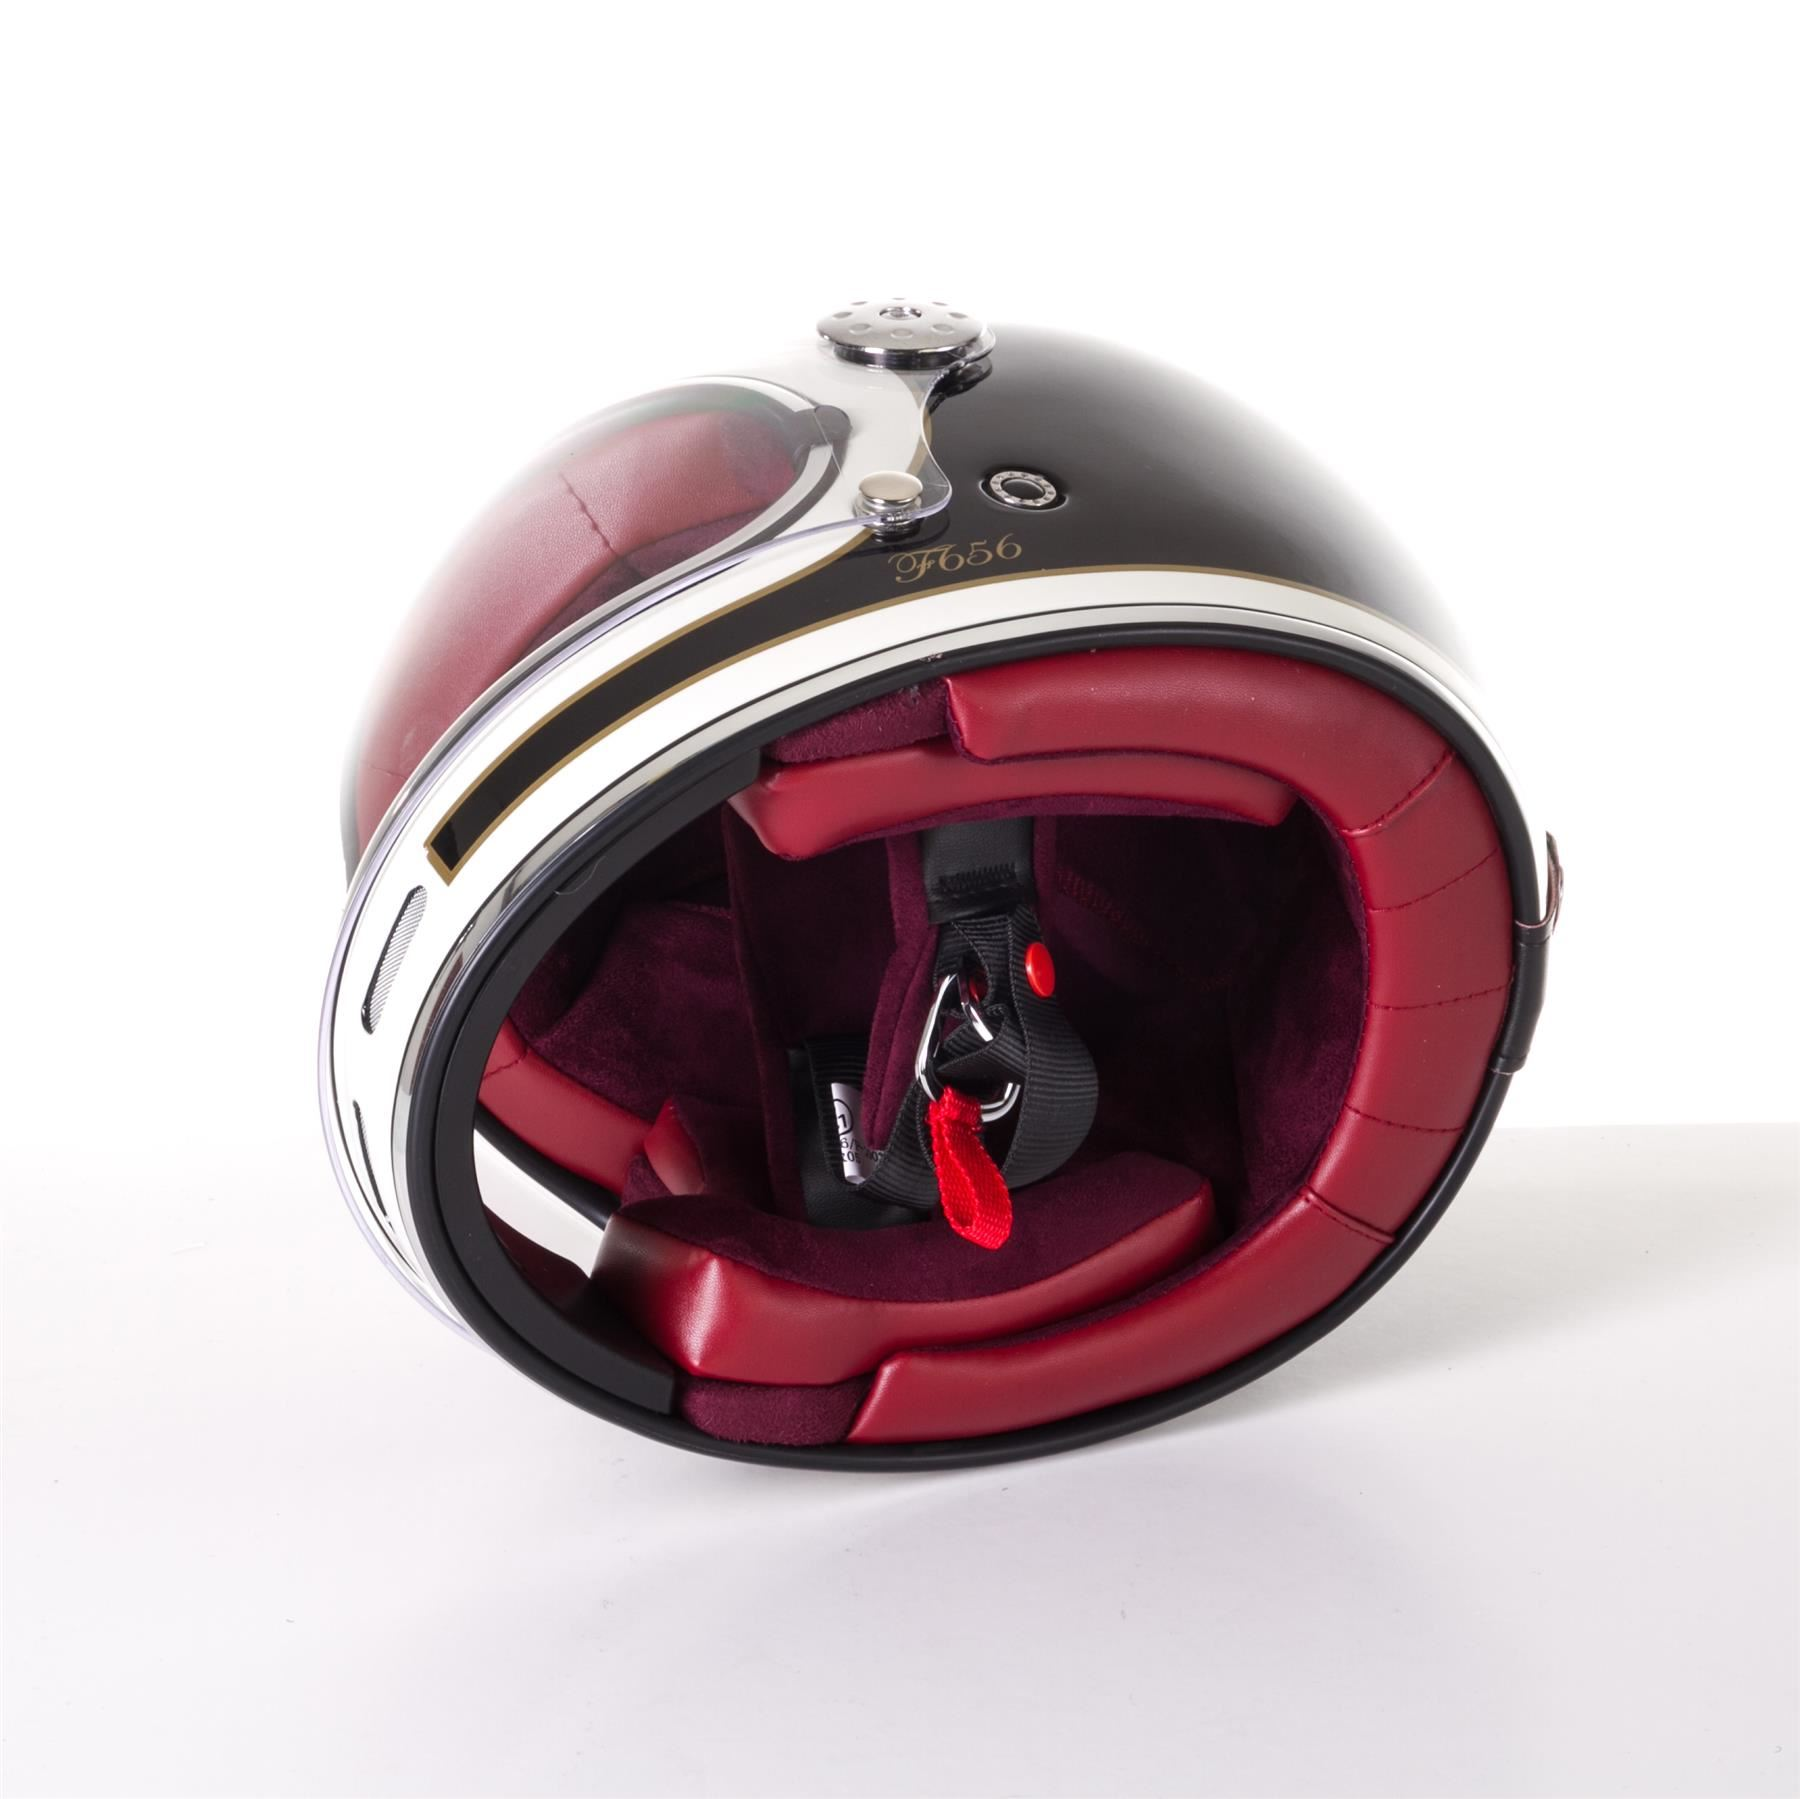 Viper-F656-Retro-Vintage-FibreGlass-Full-Face-Motorcycle-Bike-Road-Crash-Helmet miniature 7